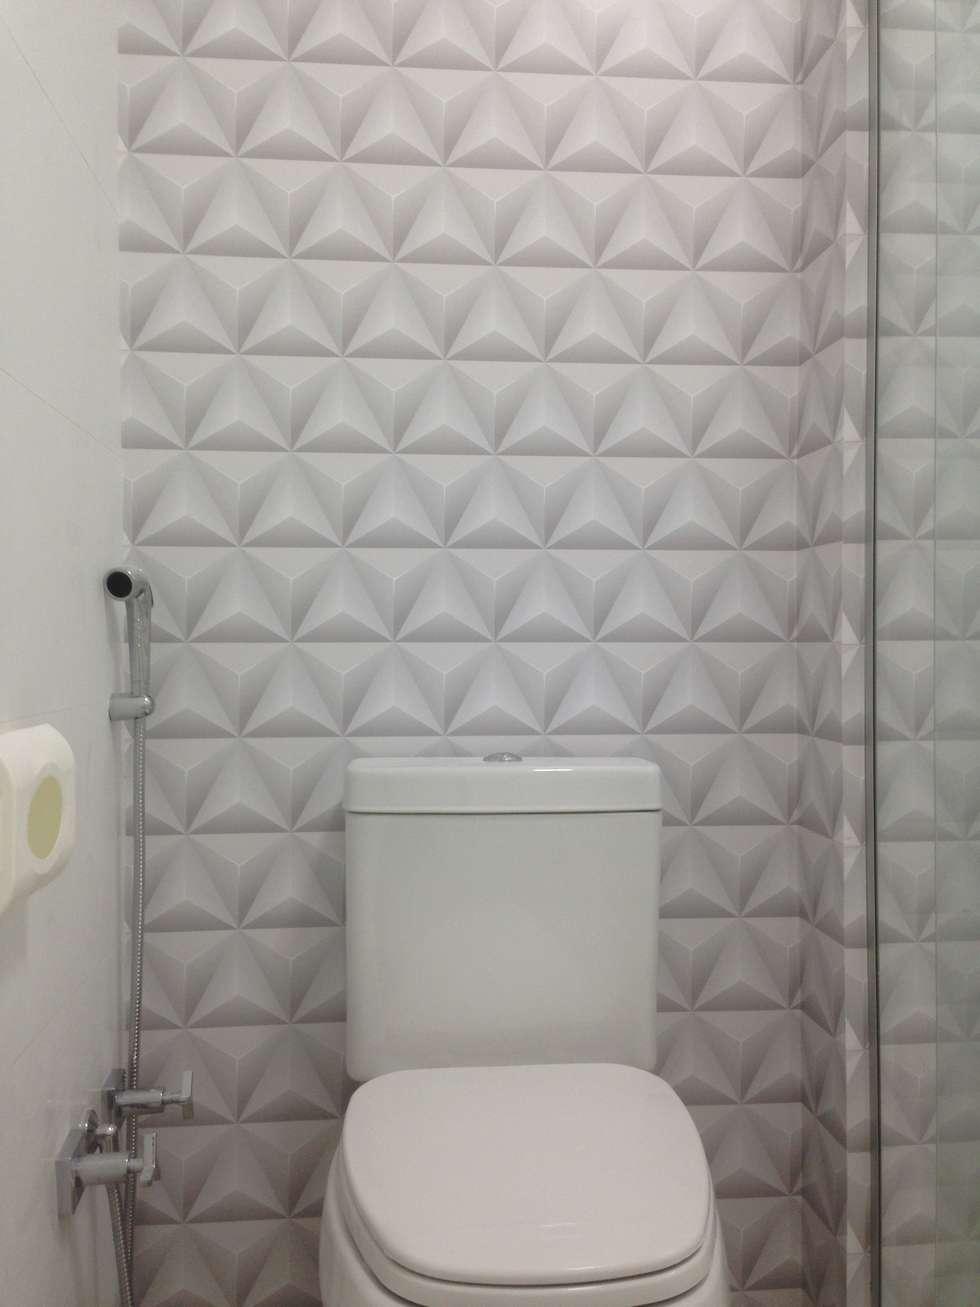 Fotos de banheiro : papel de parede tri?ngulo volumetria homify